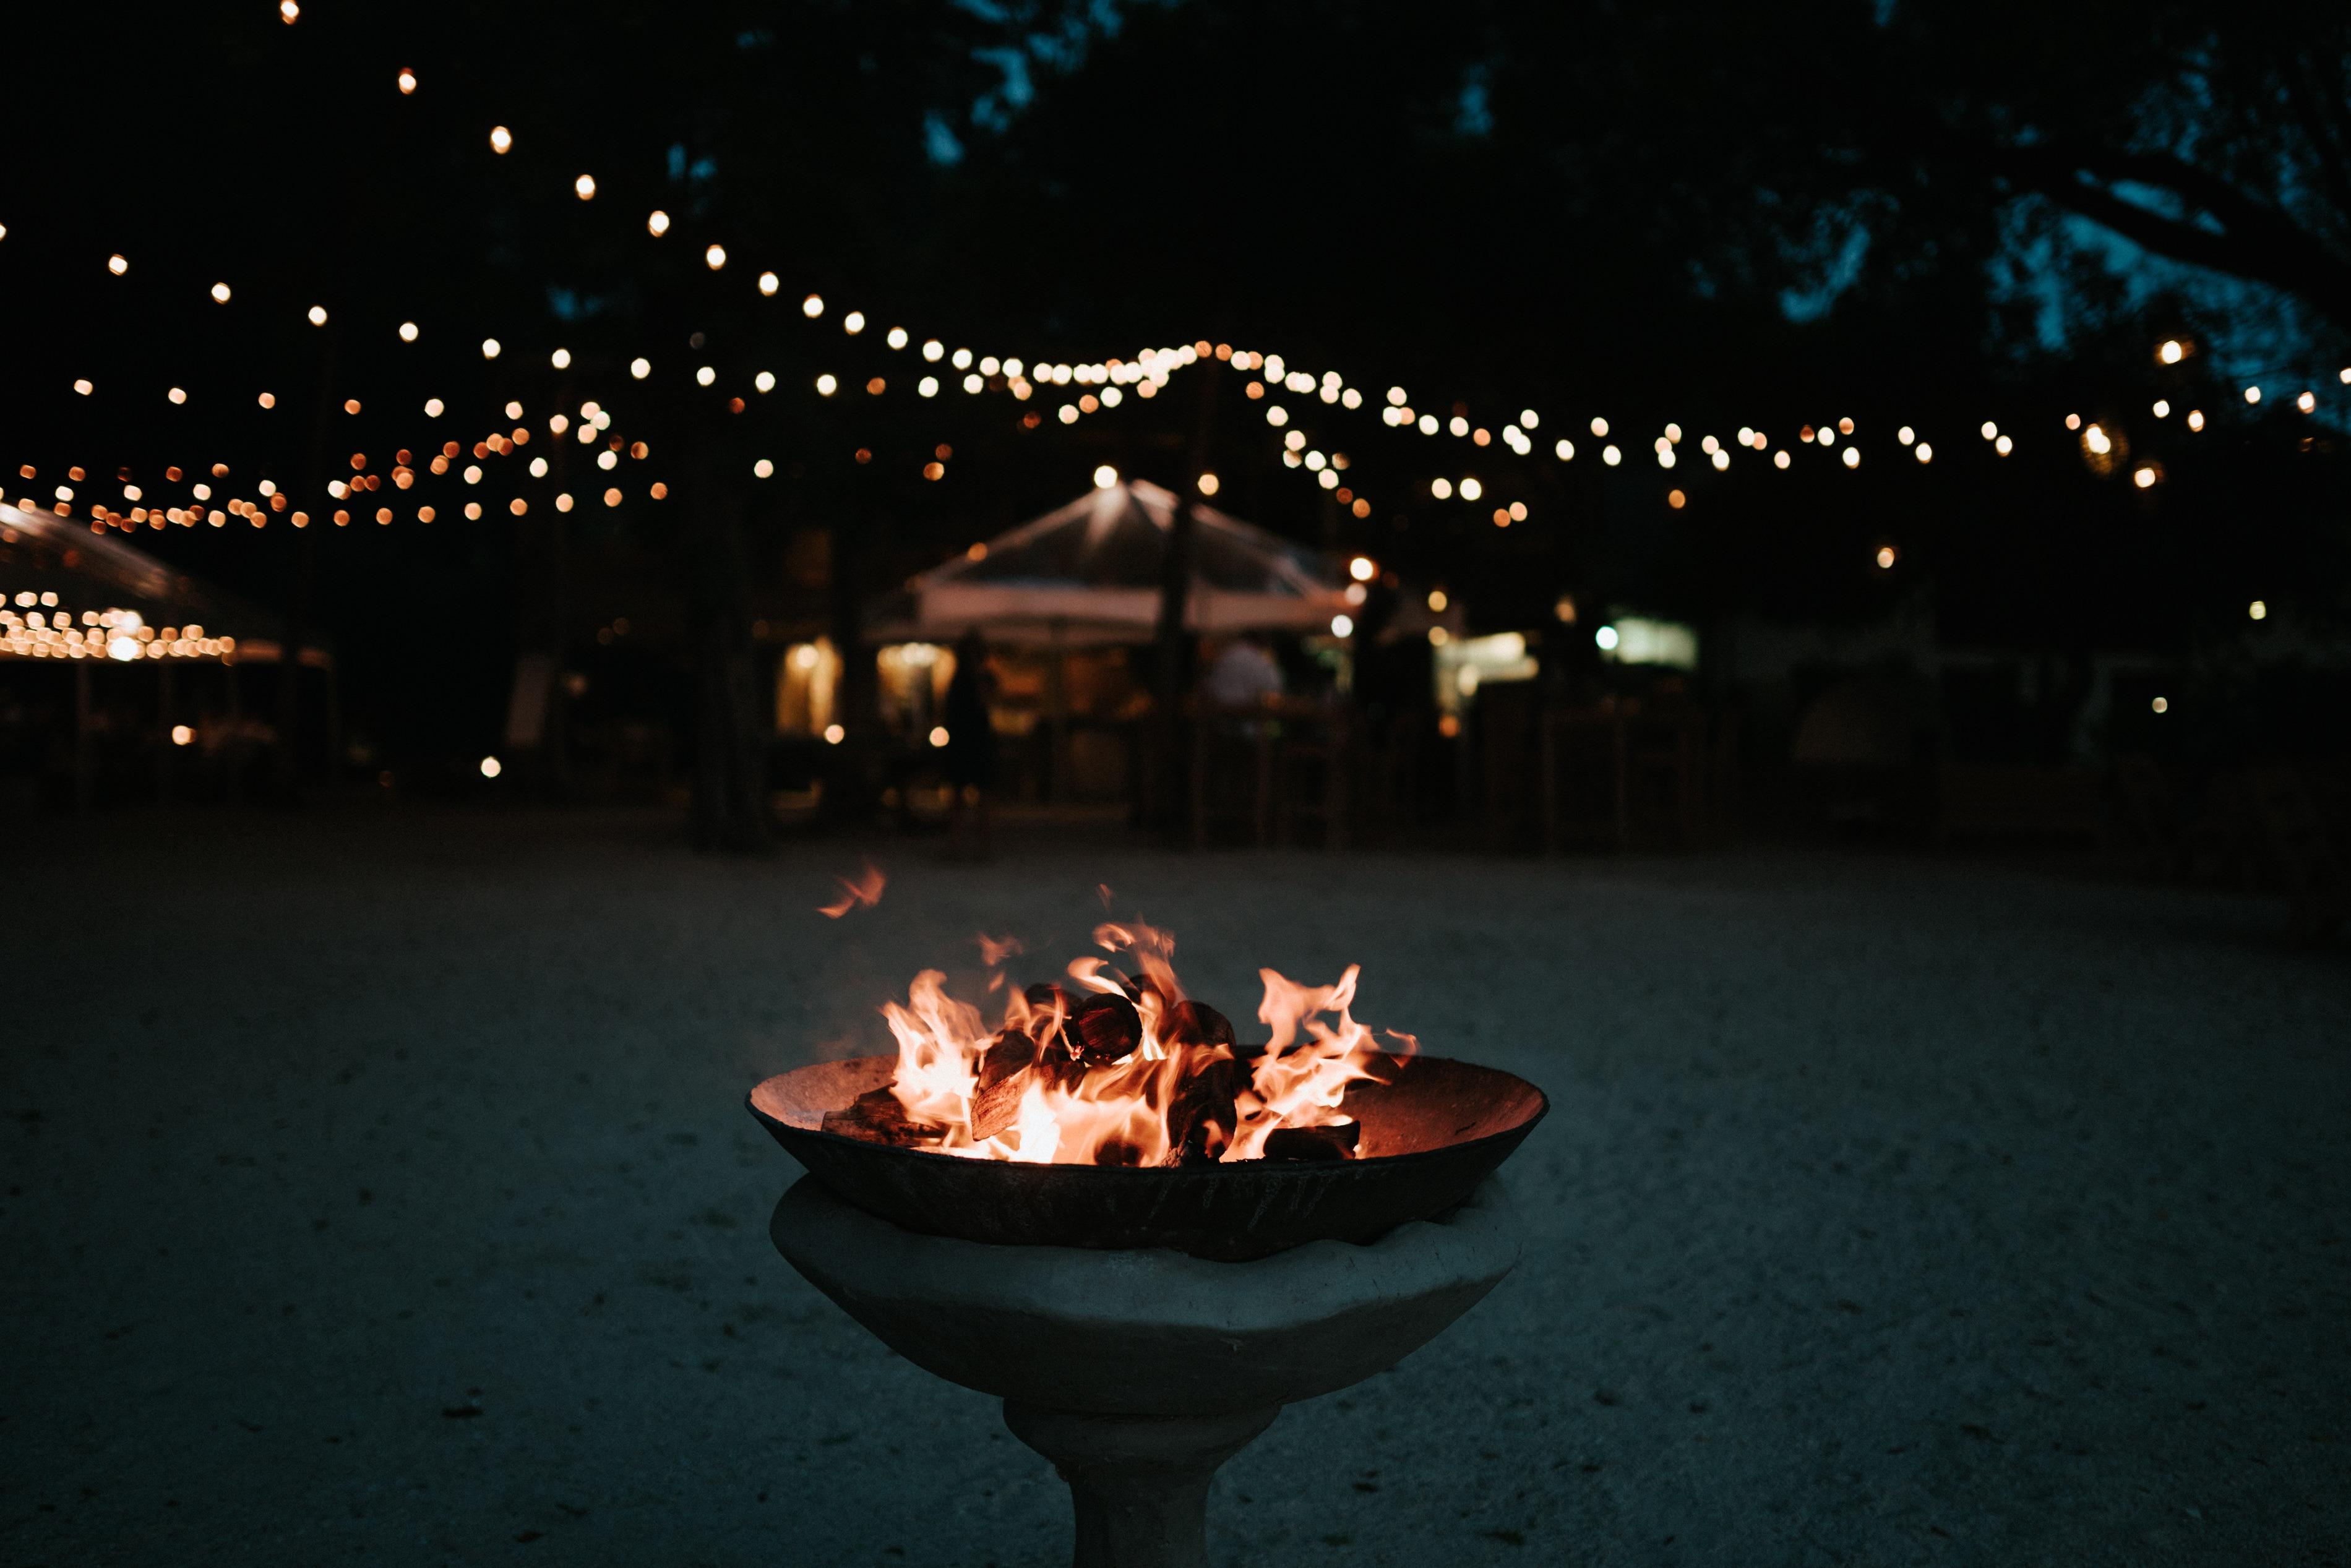 Bonfire Costa Rica Wedding, Wedding Planner: Meghan Cox, Mil Besos, Photographer: Costa Vida